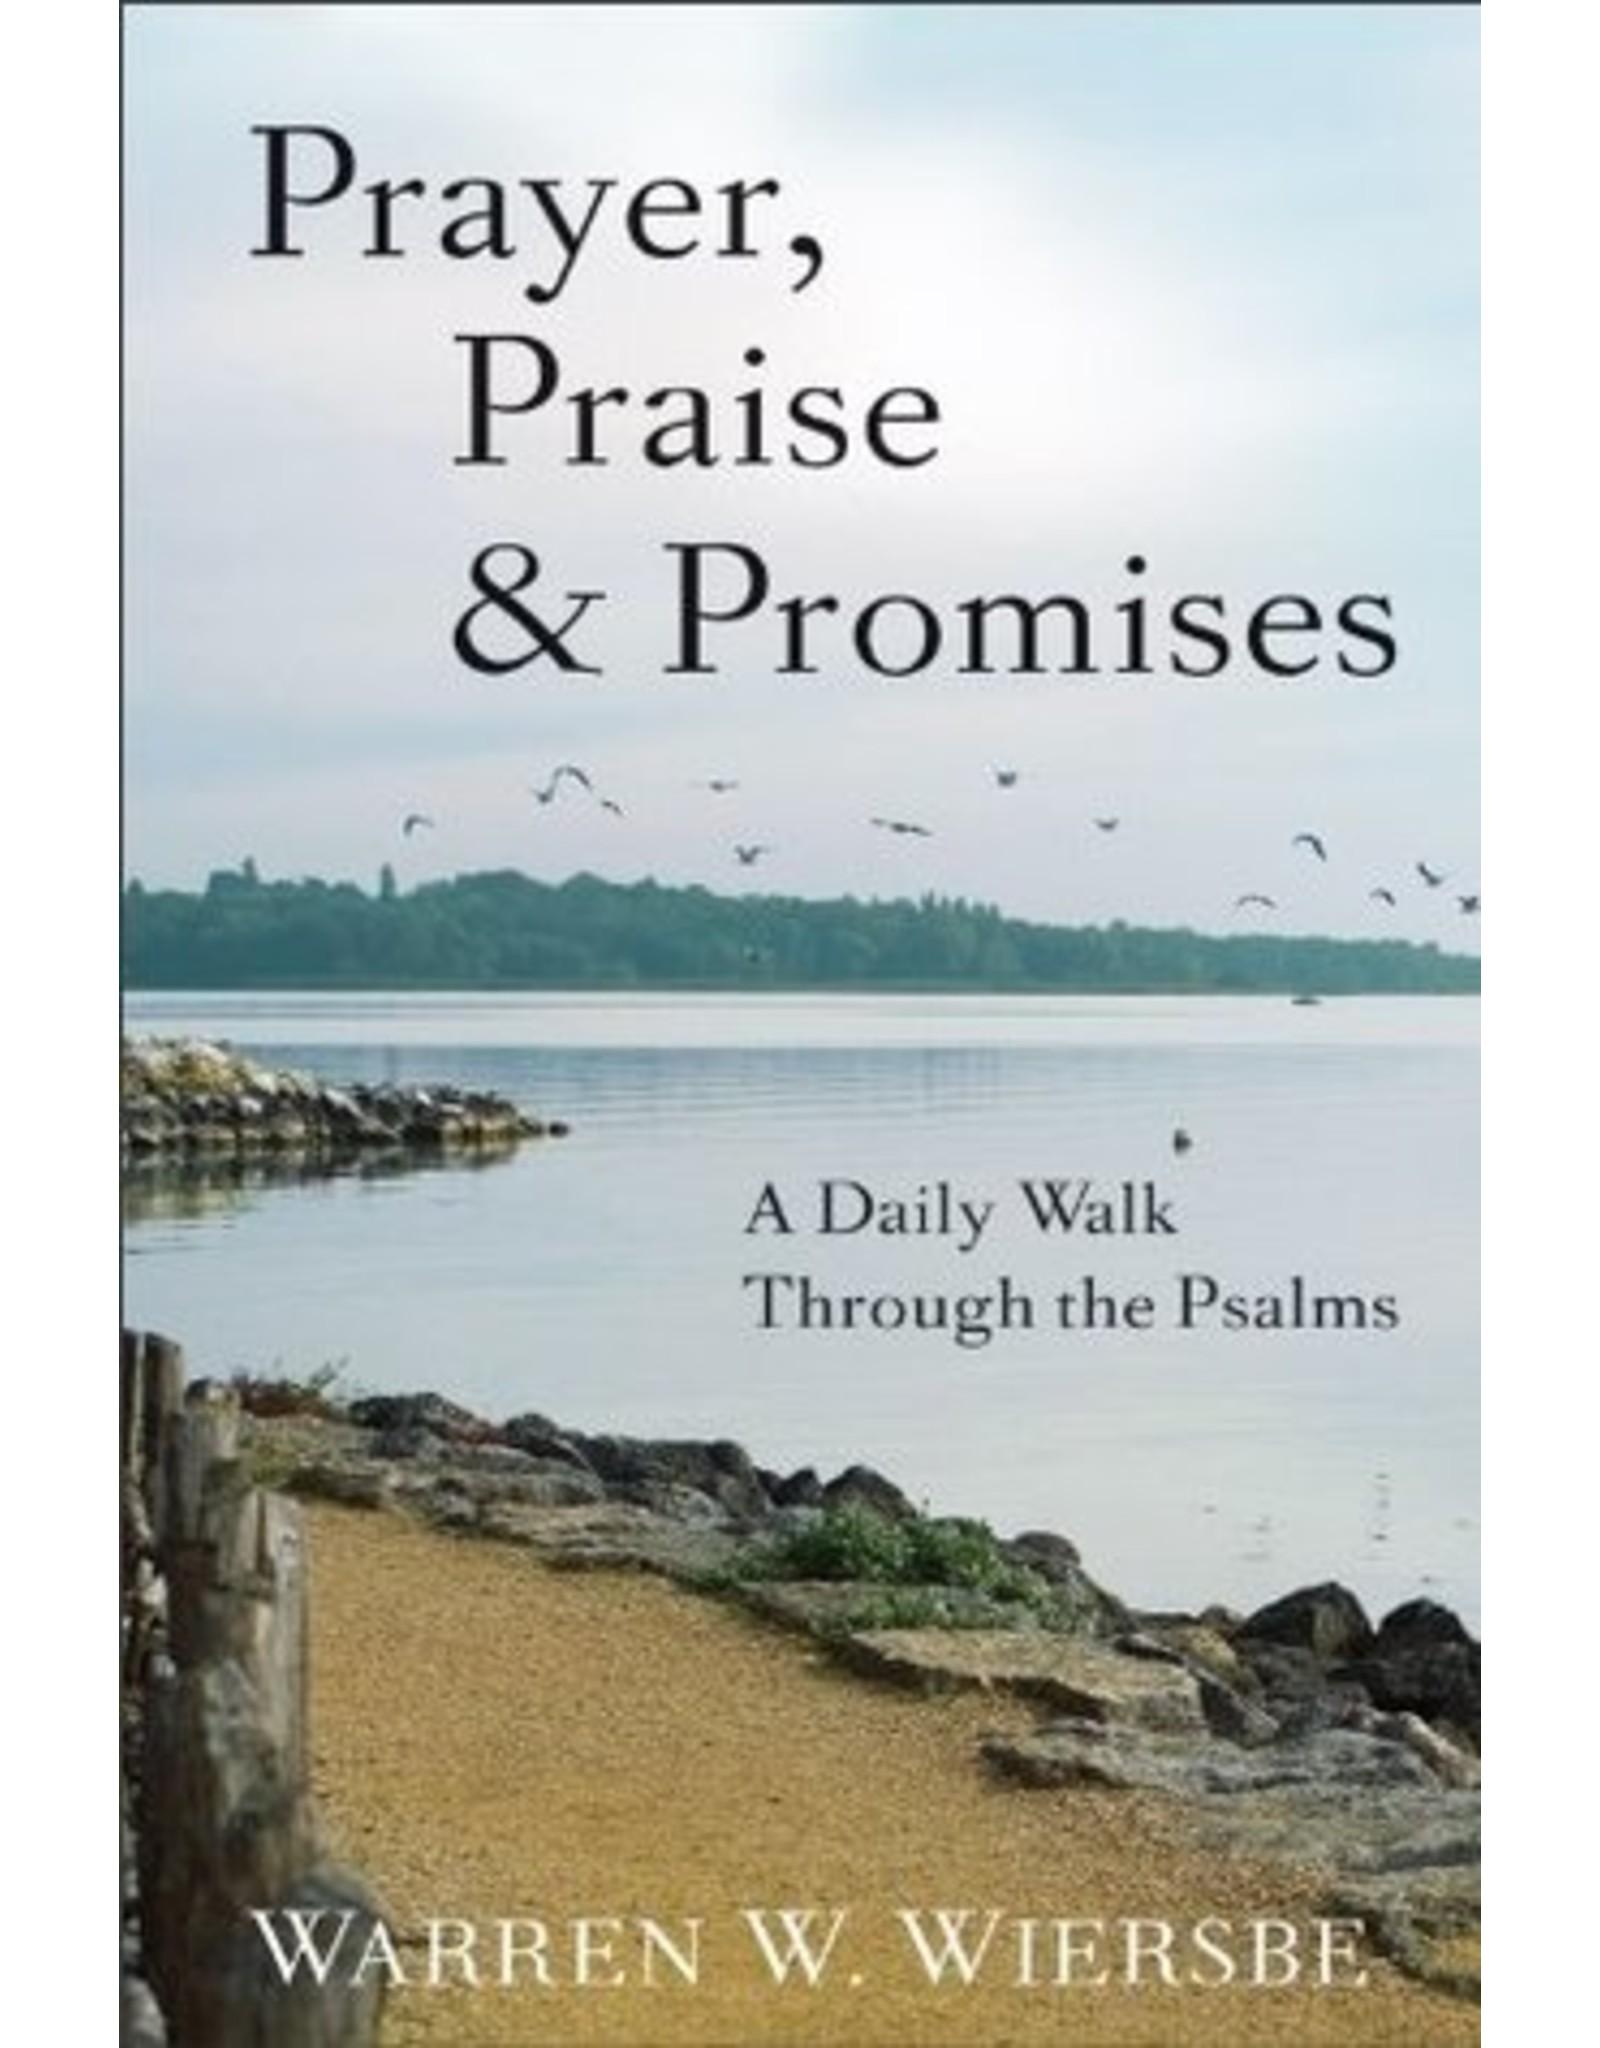 Wiersbe Prayer, Praise and Promises